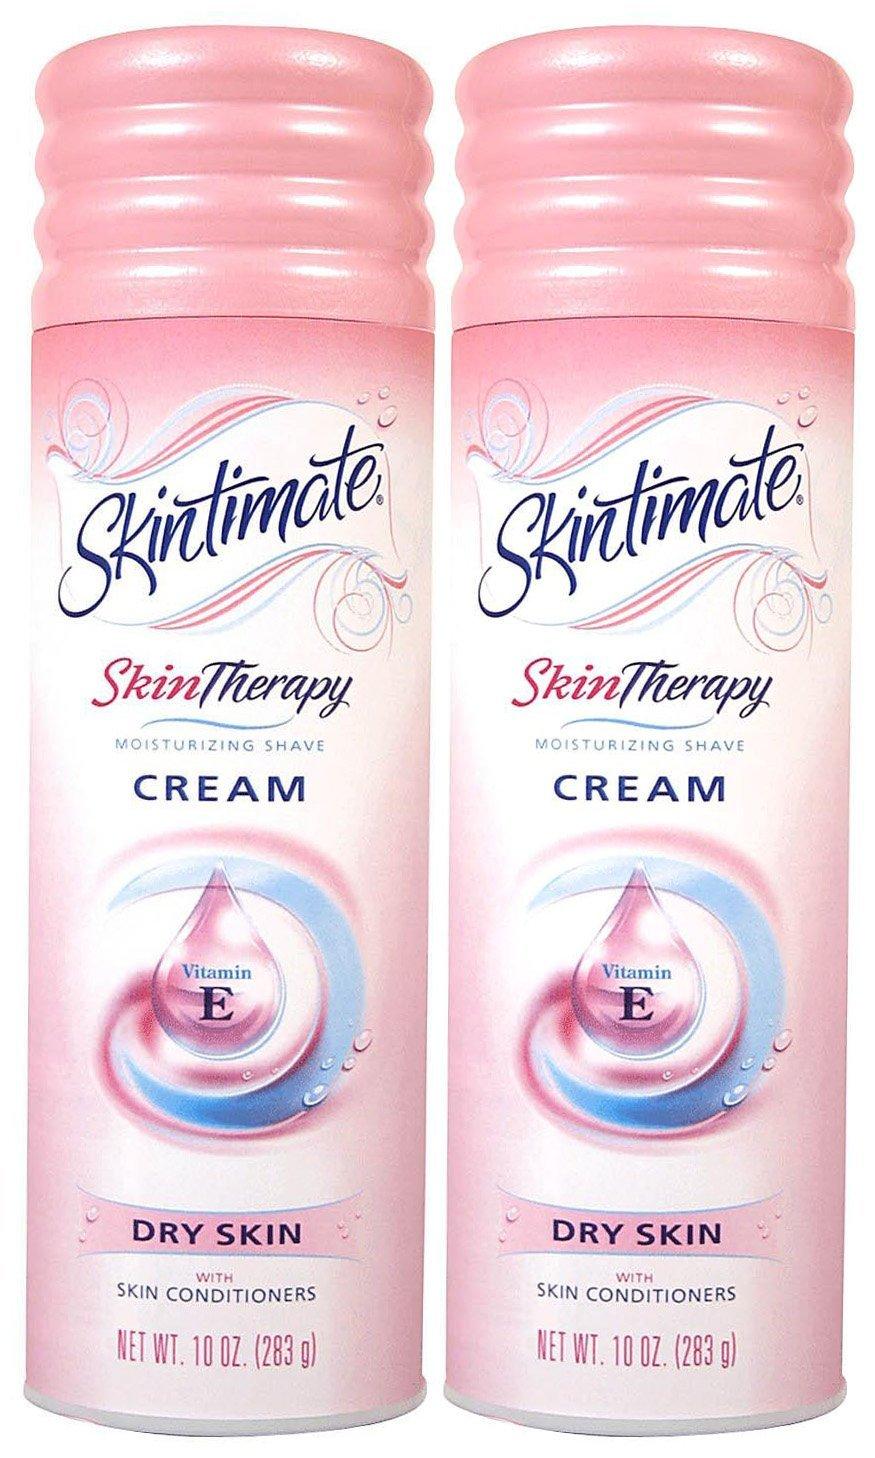 Skintimate Skin Therapy Moisturizing Shave Cream Dry Skin. 1 each